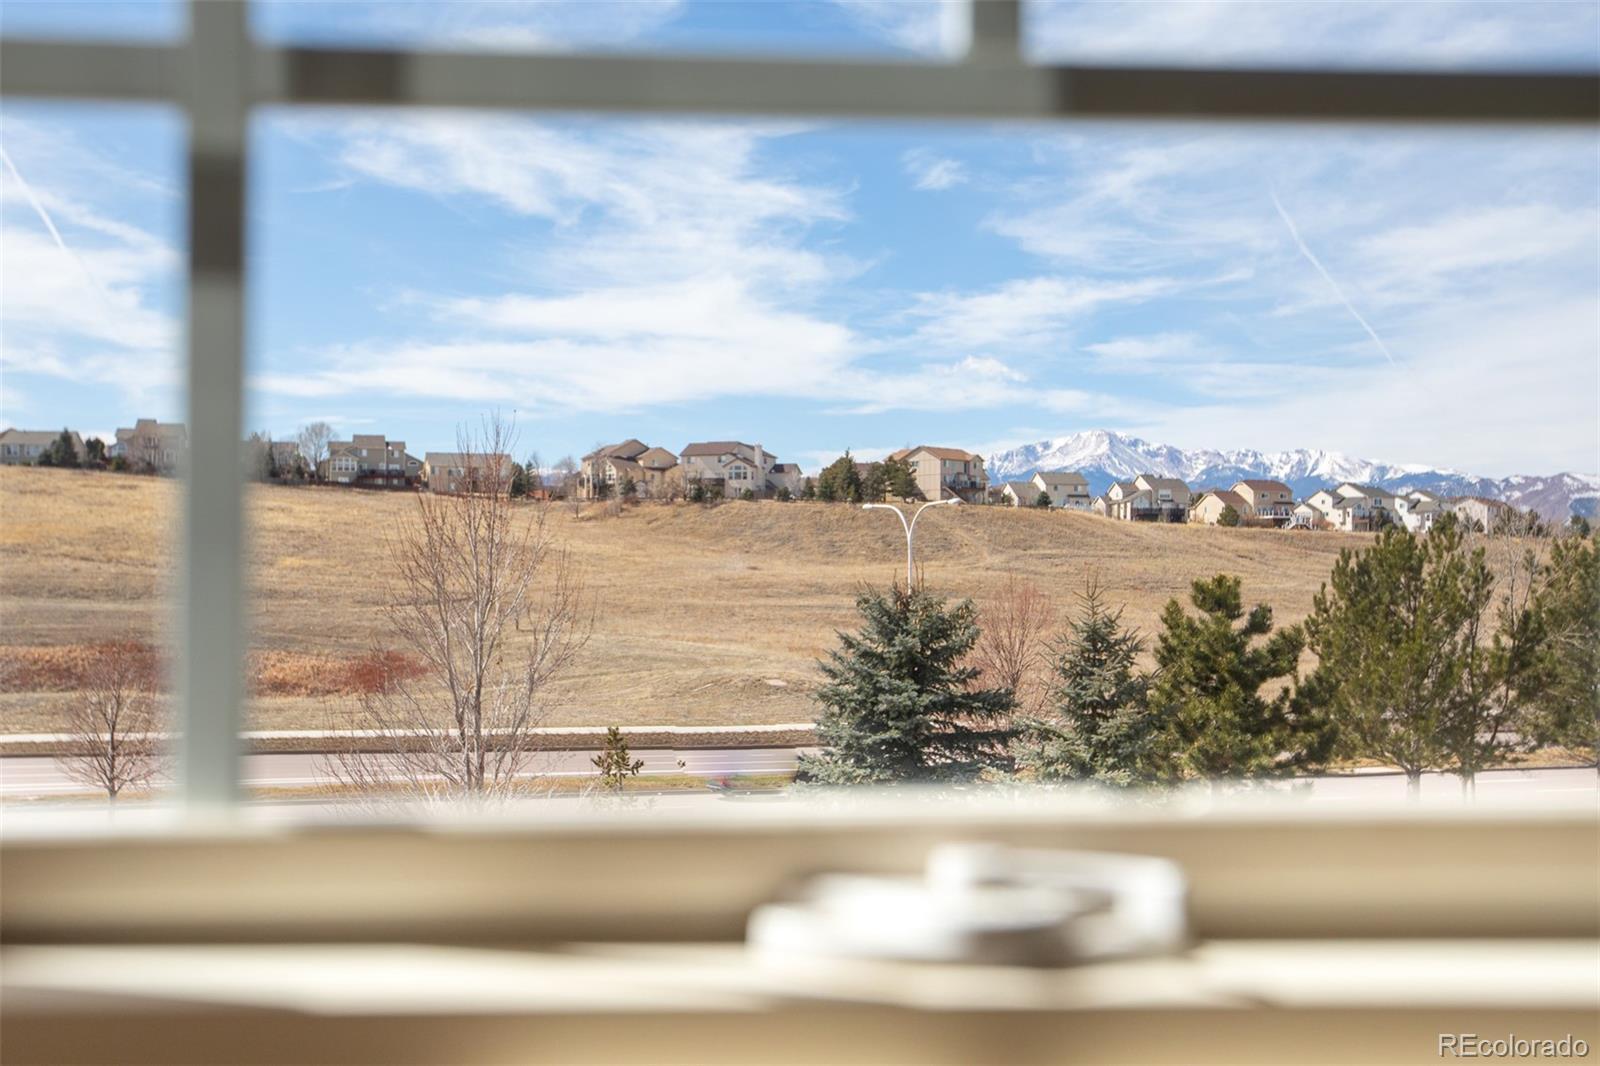 MLS# 5205820 - 5 - 3325 Hollycrest Drive, Colorado Springs, CO 80920